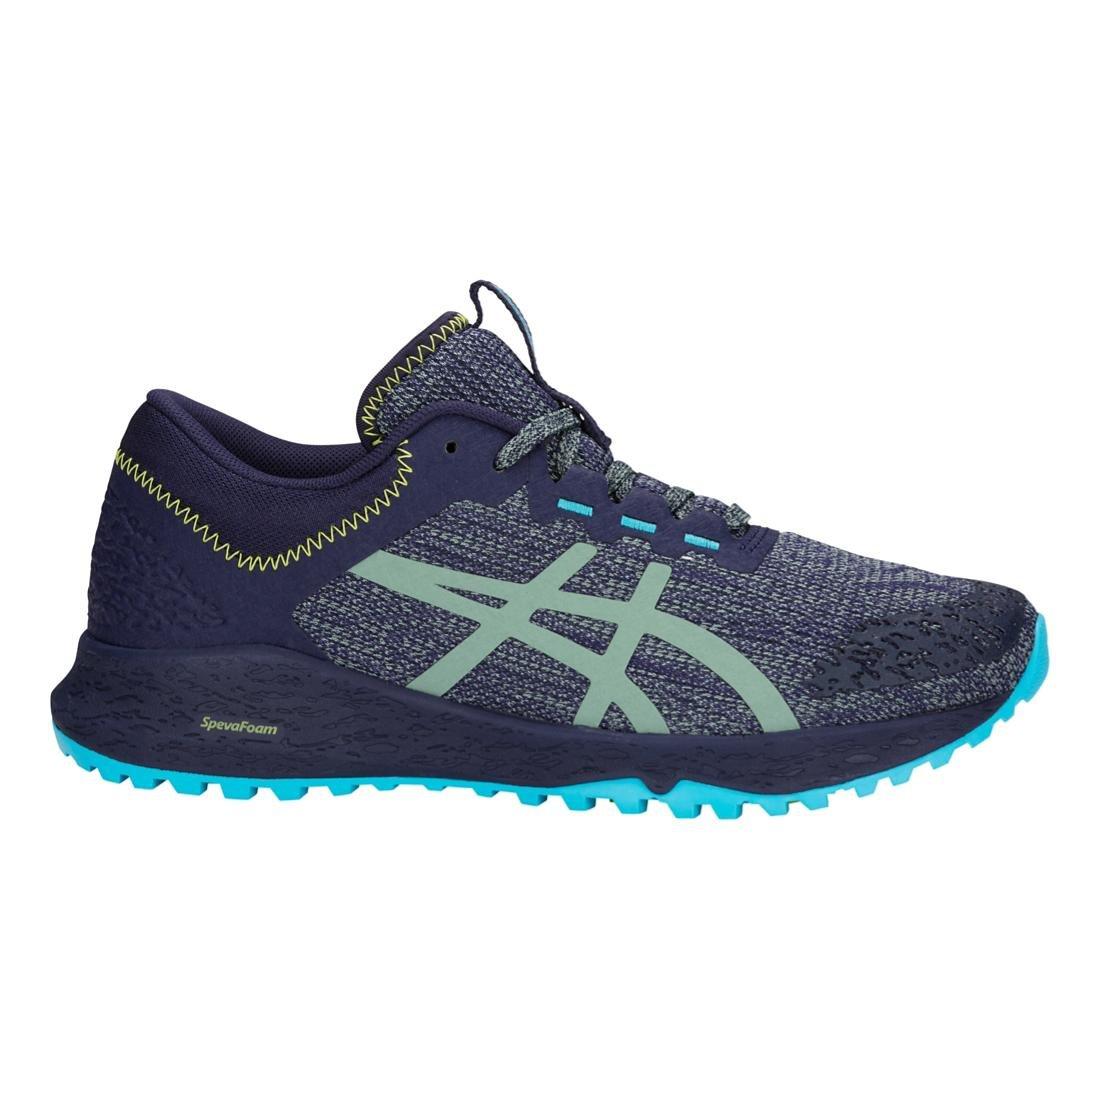 ASICS Women's Alpine XT Running Shoe B077MMSWM9 11 B(M) US|Slate Grey/Slate Grey